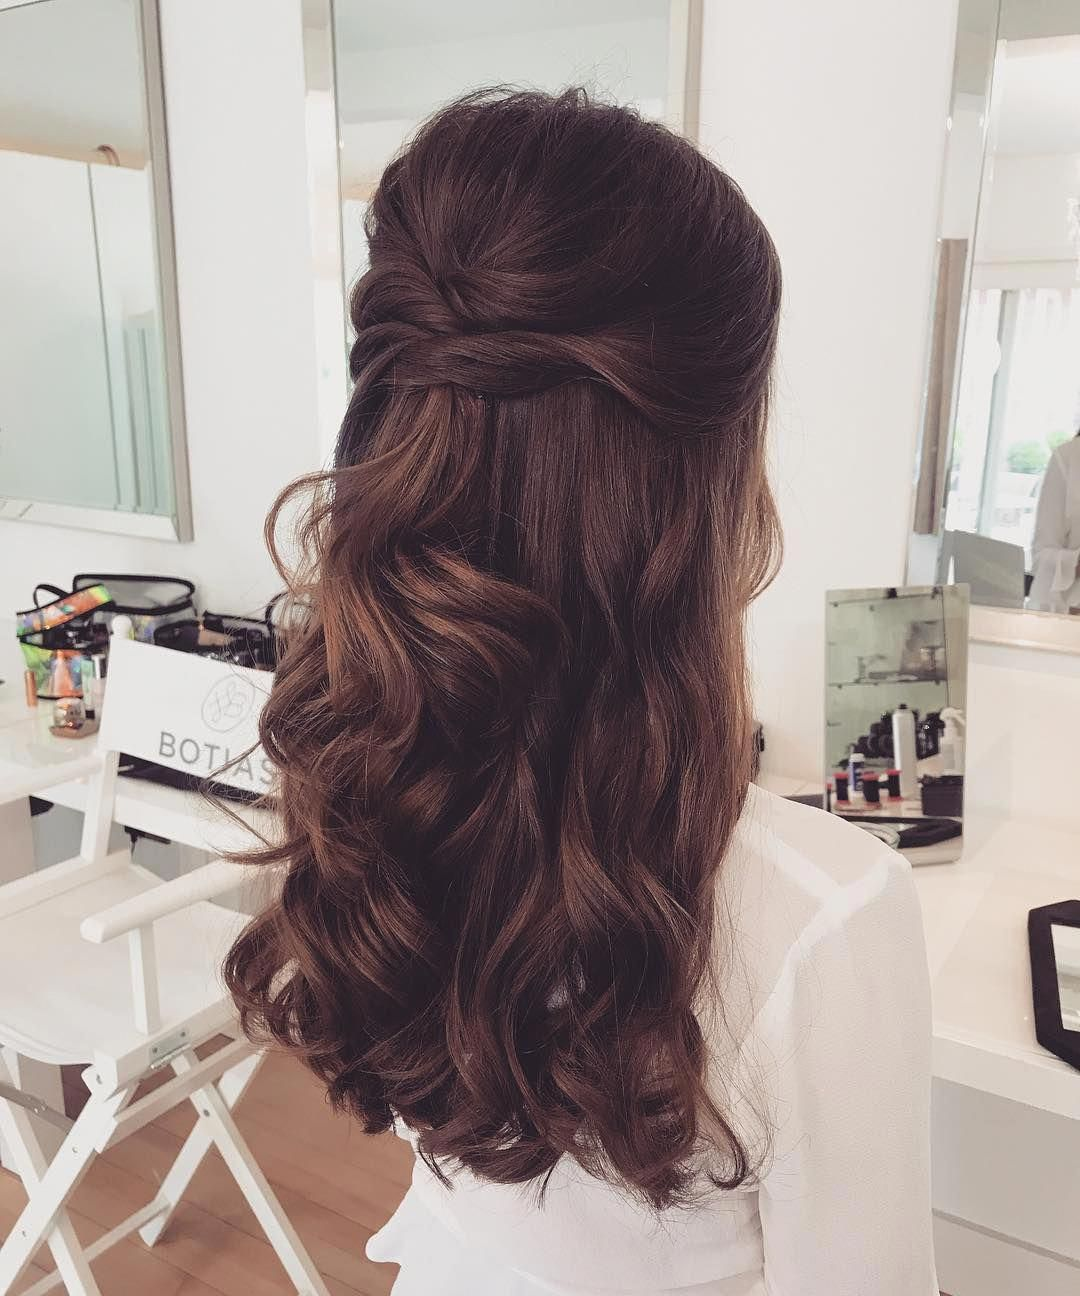 Beautiful Half Up Half Down Wedding Hairstyles 1813 Hair Styles Wedding Hairstyles For Long Hair Down Hairstyles